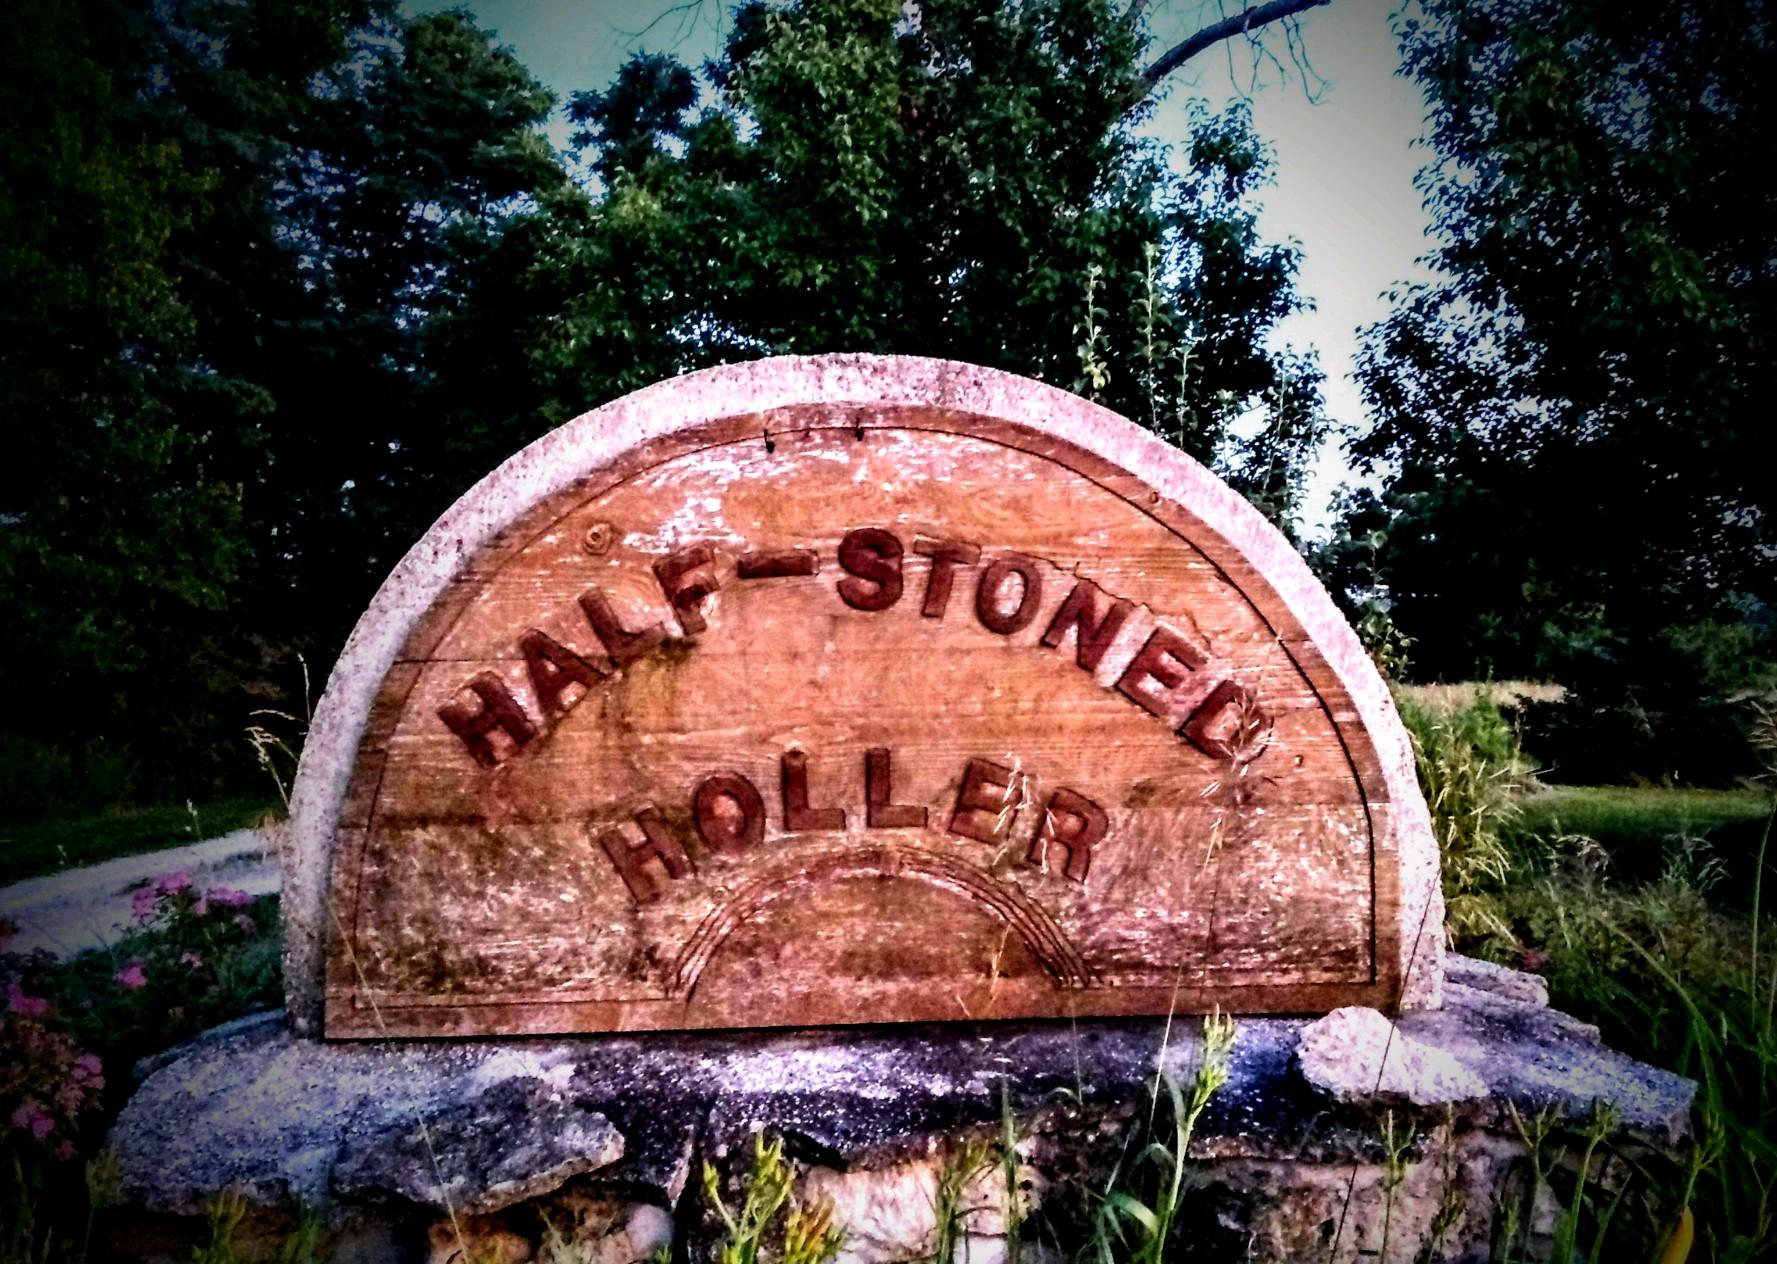 Half Stoned Holler